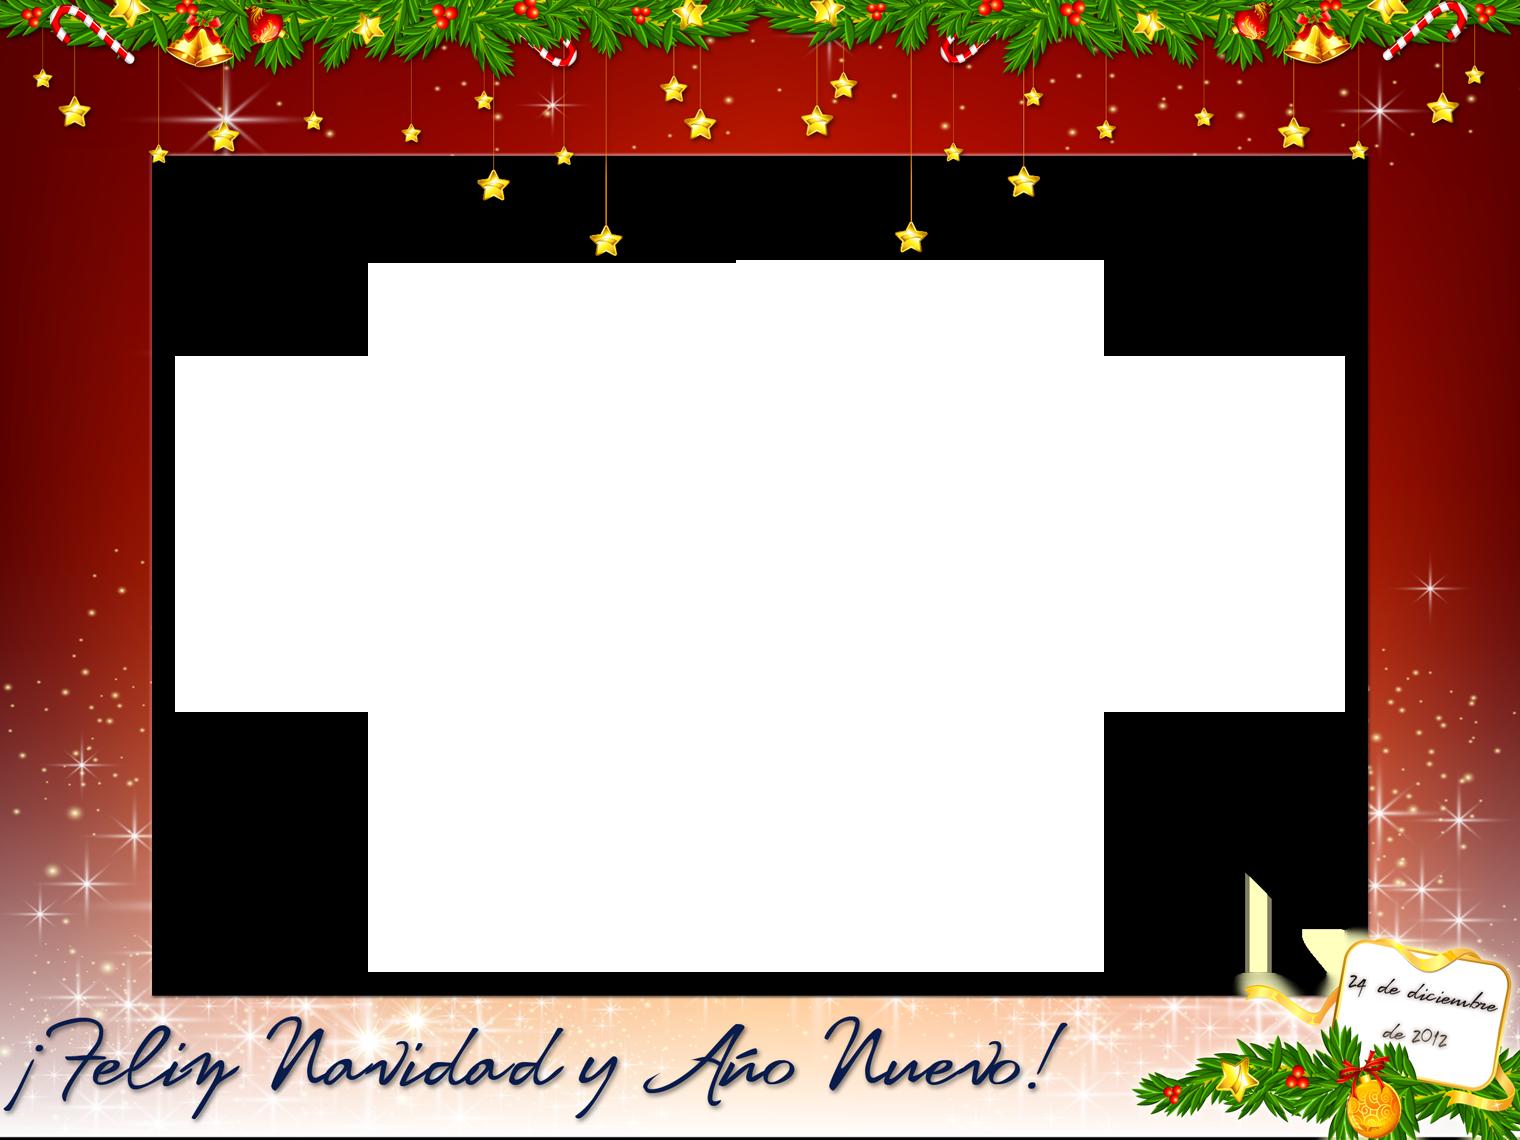 Marcos creativos para tus fotos Marco para esta Navidad | Sain-Seiya ...